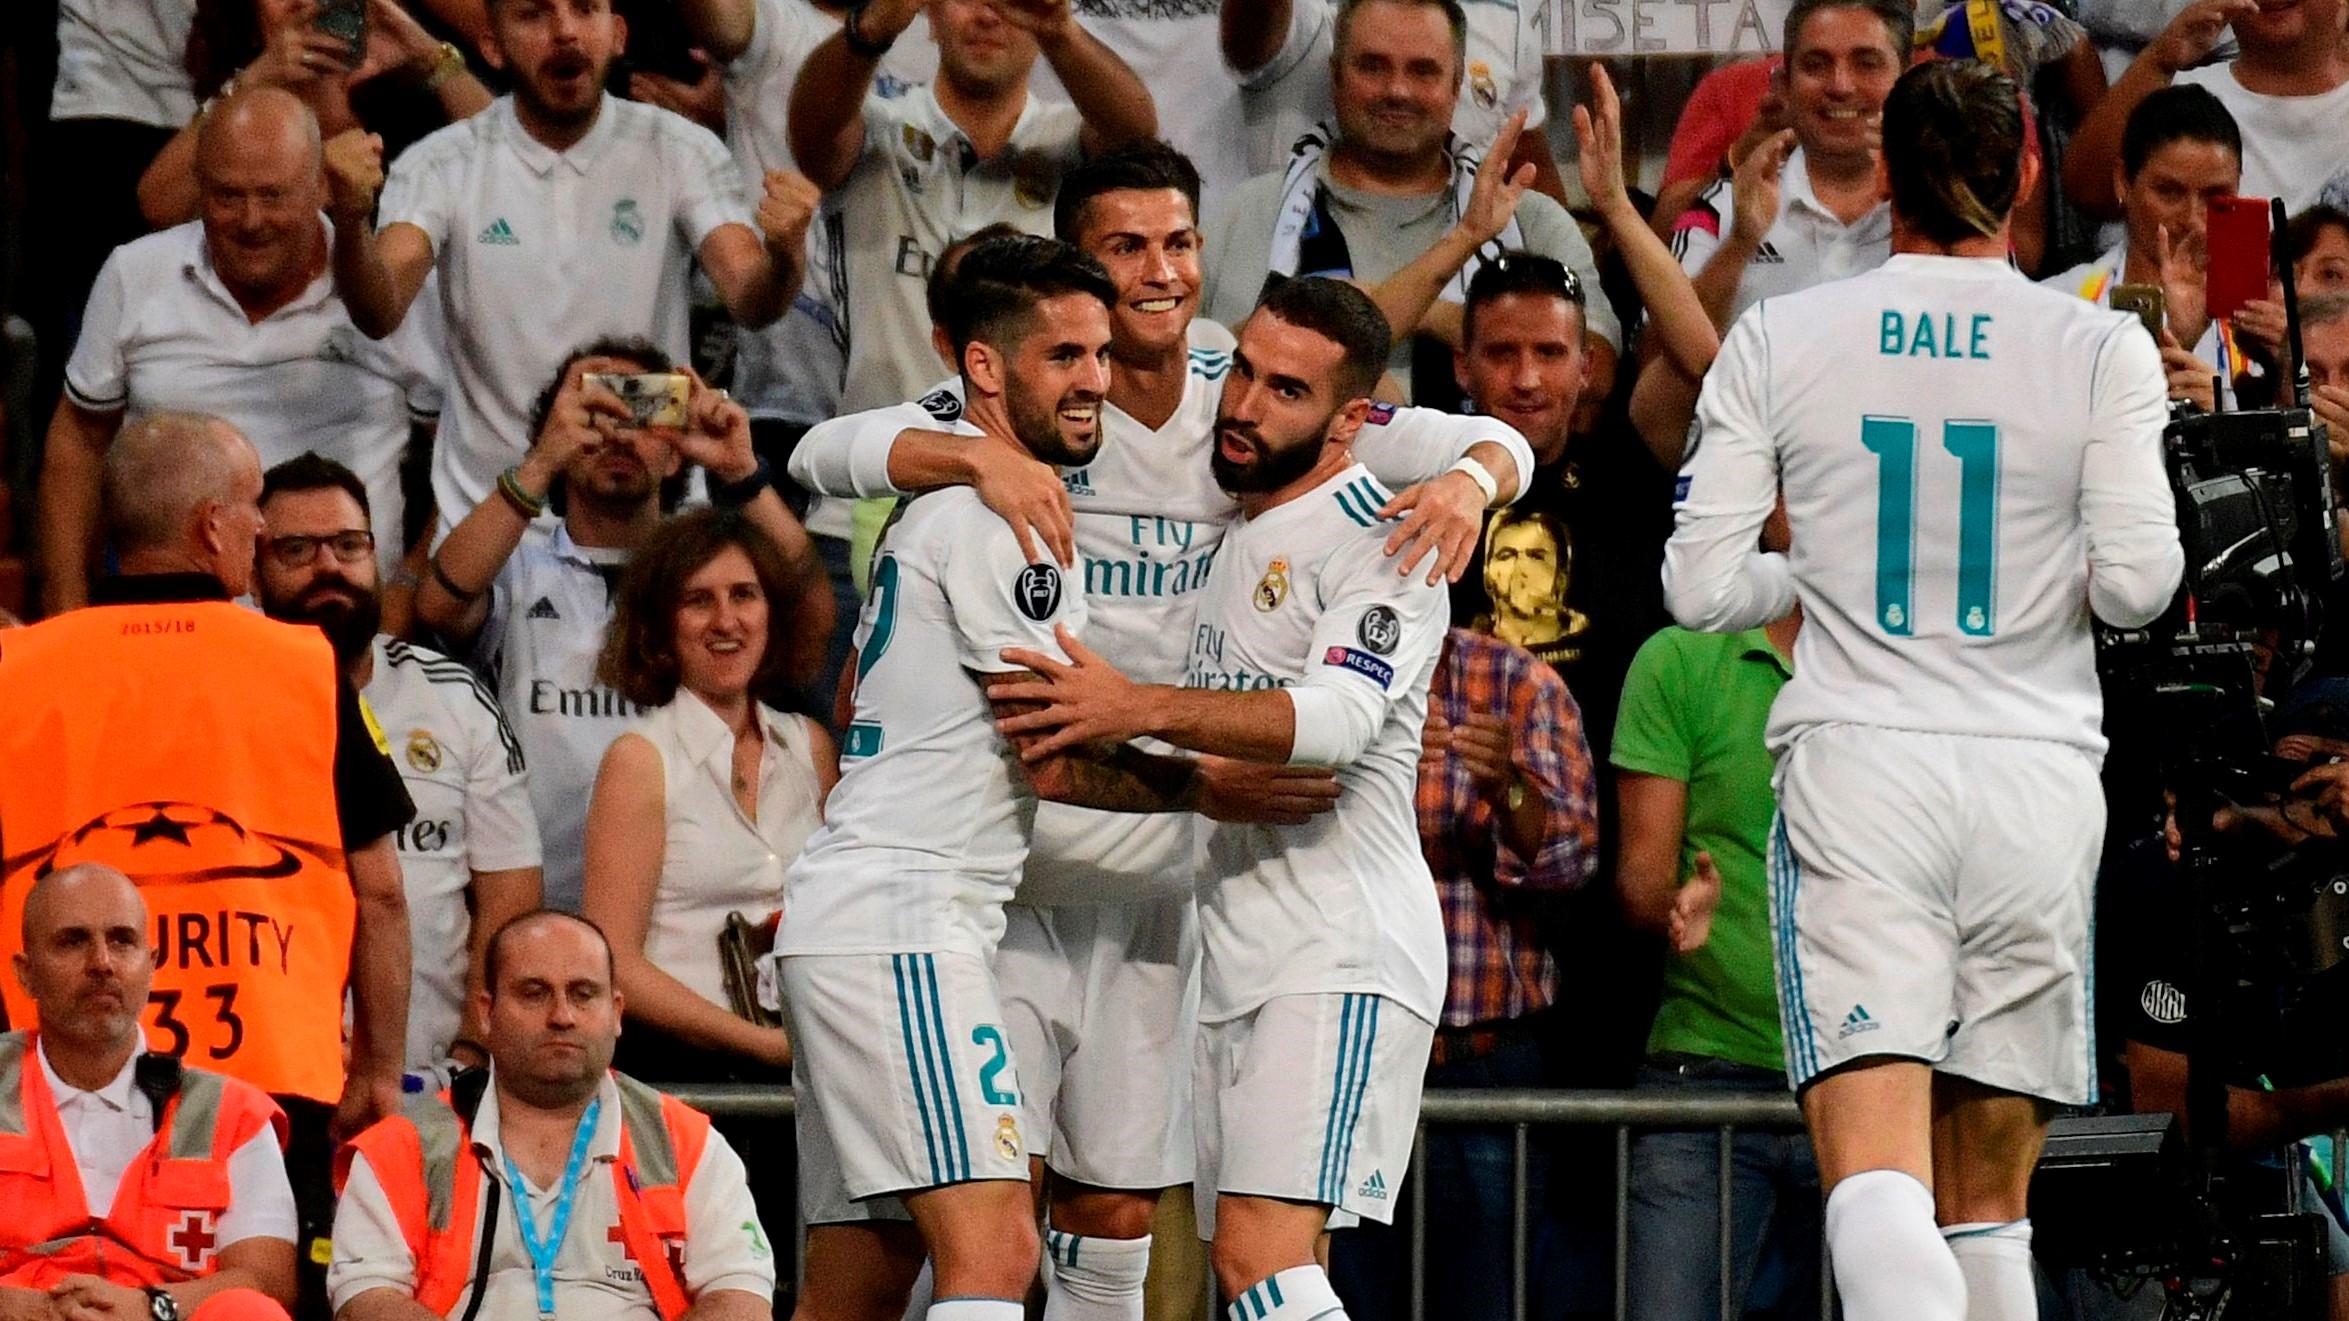 Real Madrid vence Real Sociedad fora e se reabilita — ESPANHOL